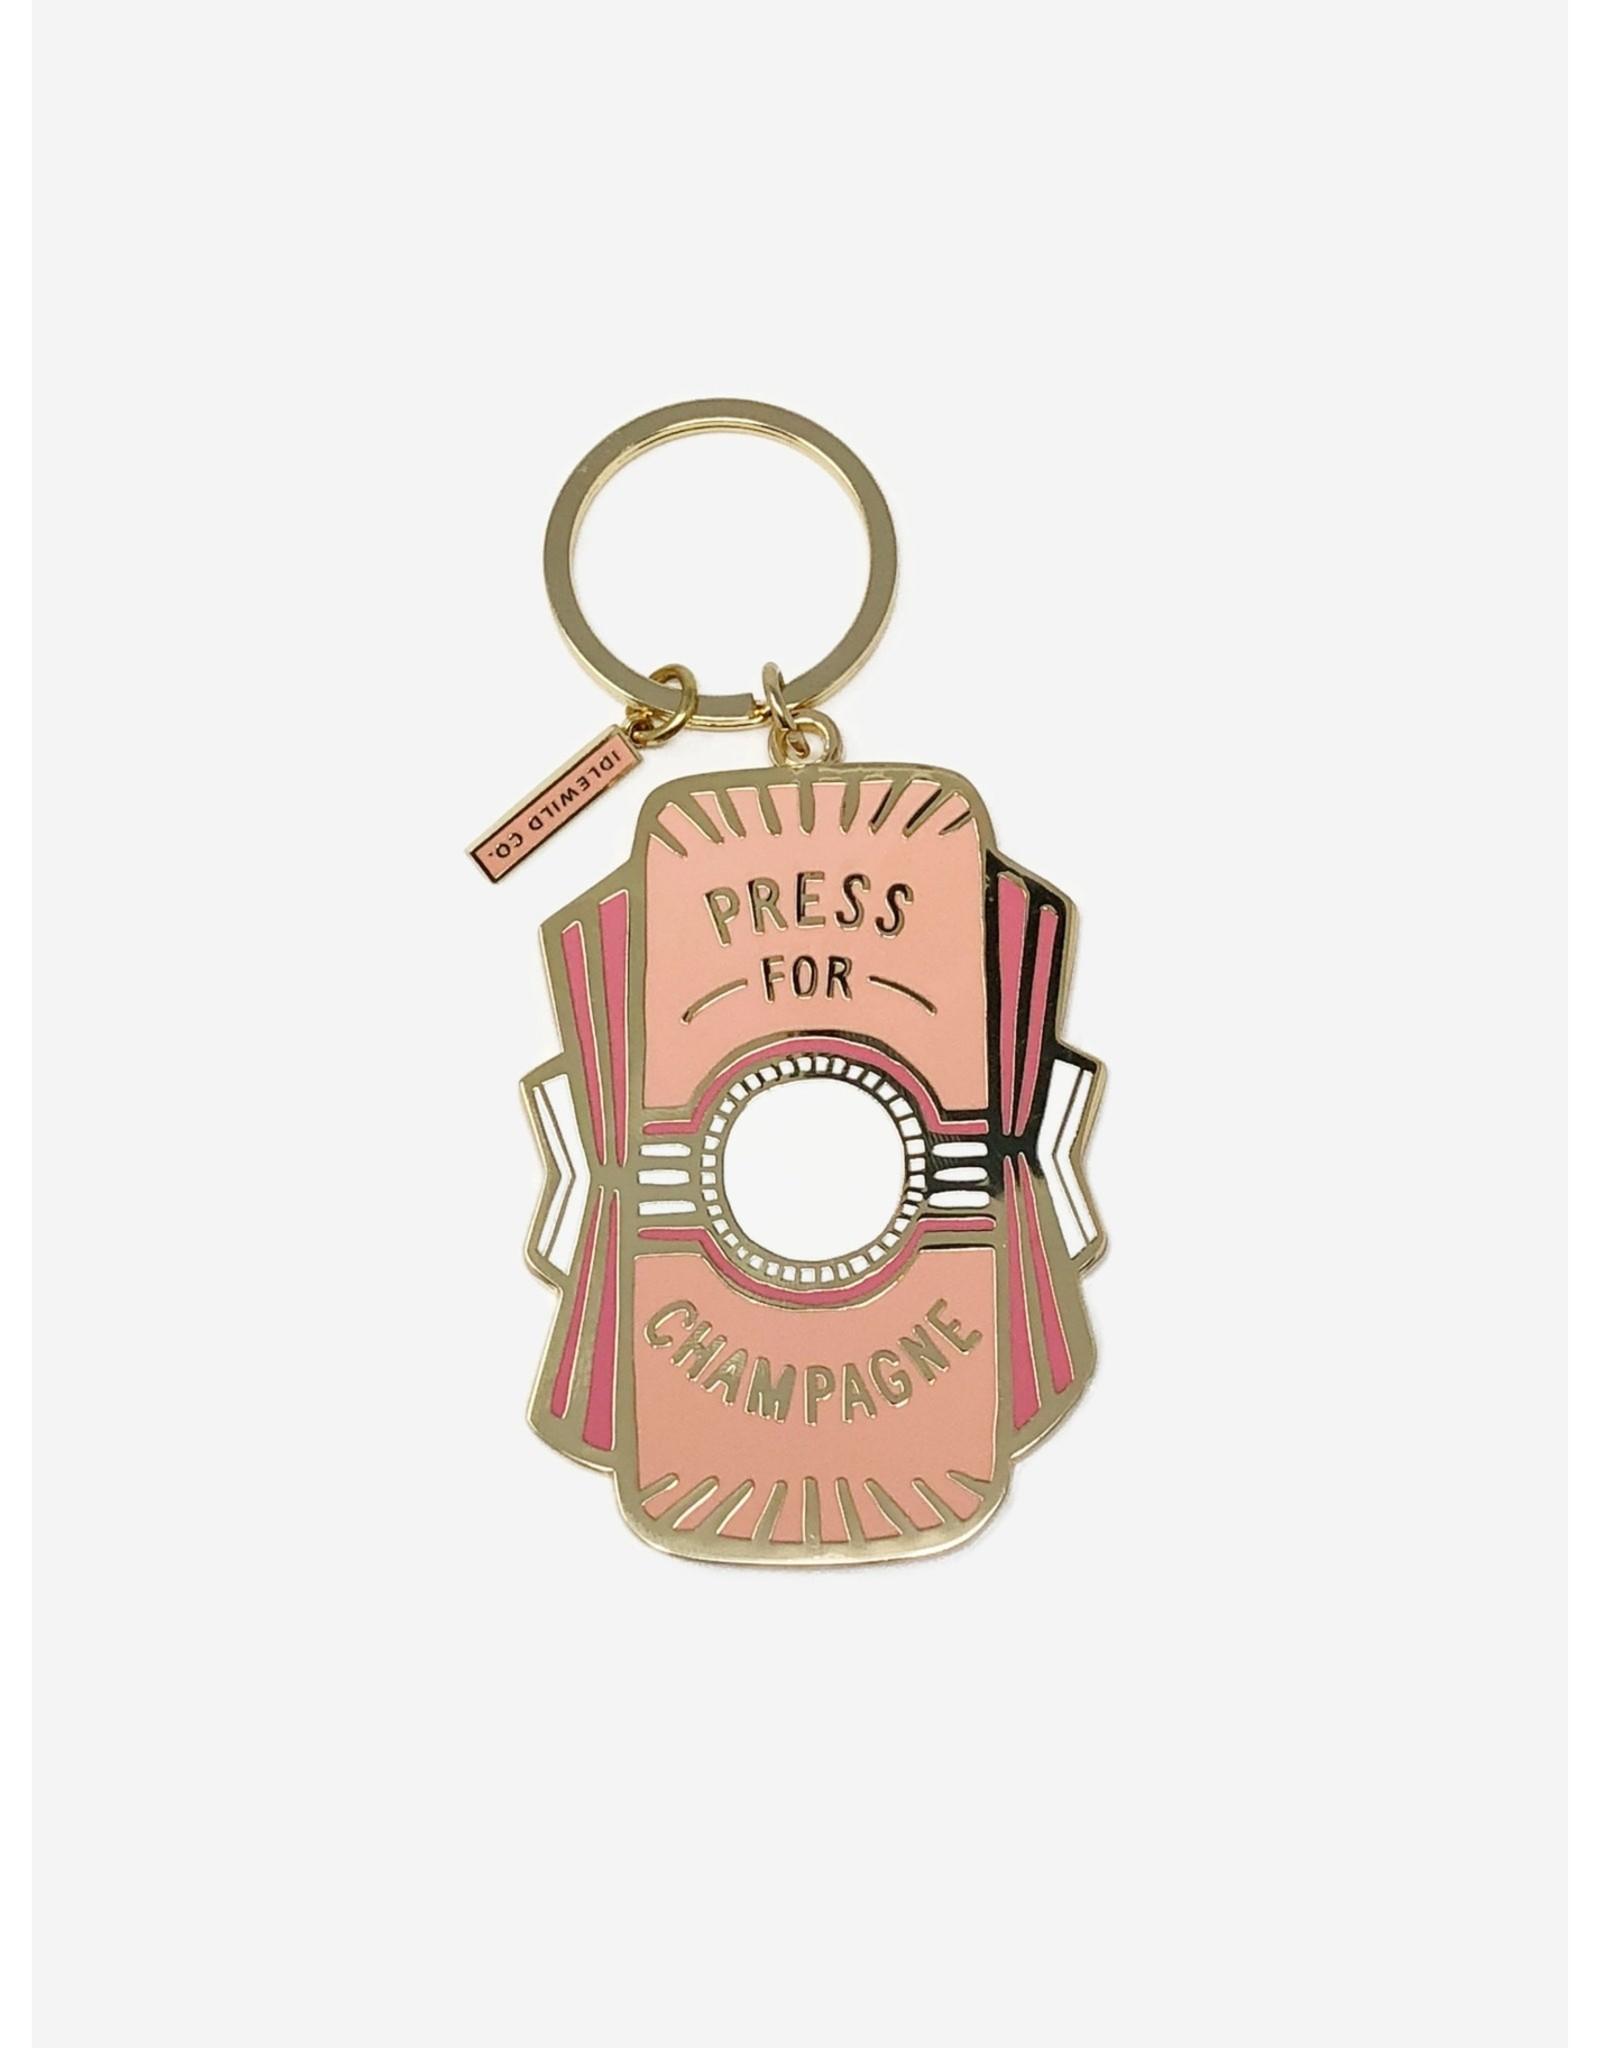 Idlewild Co. Keychain - Press for Champagne